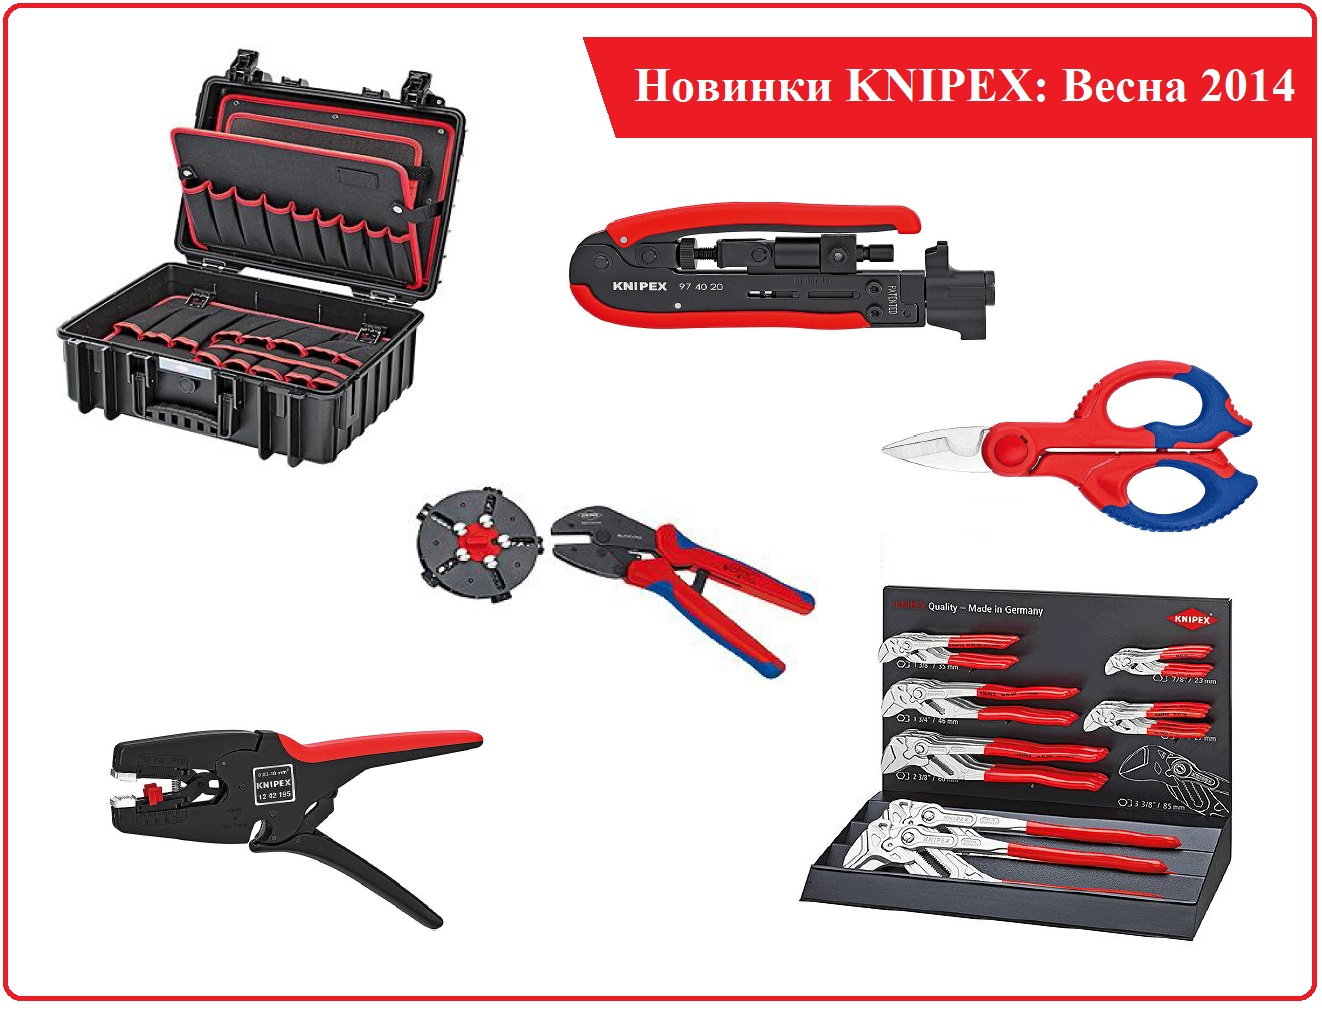 Новинки Knipex 2014